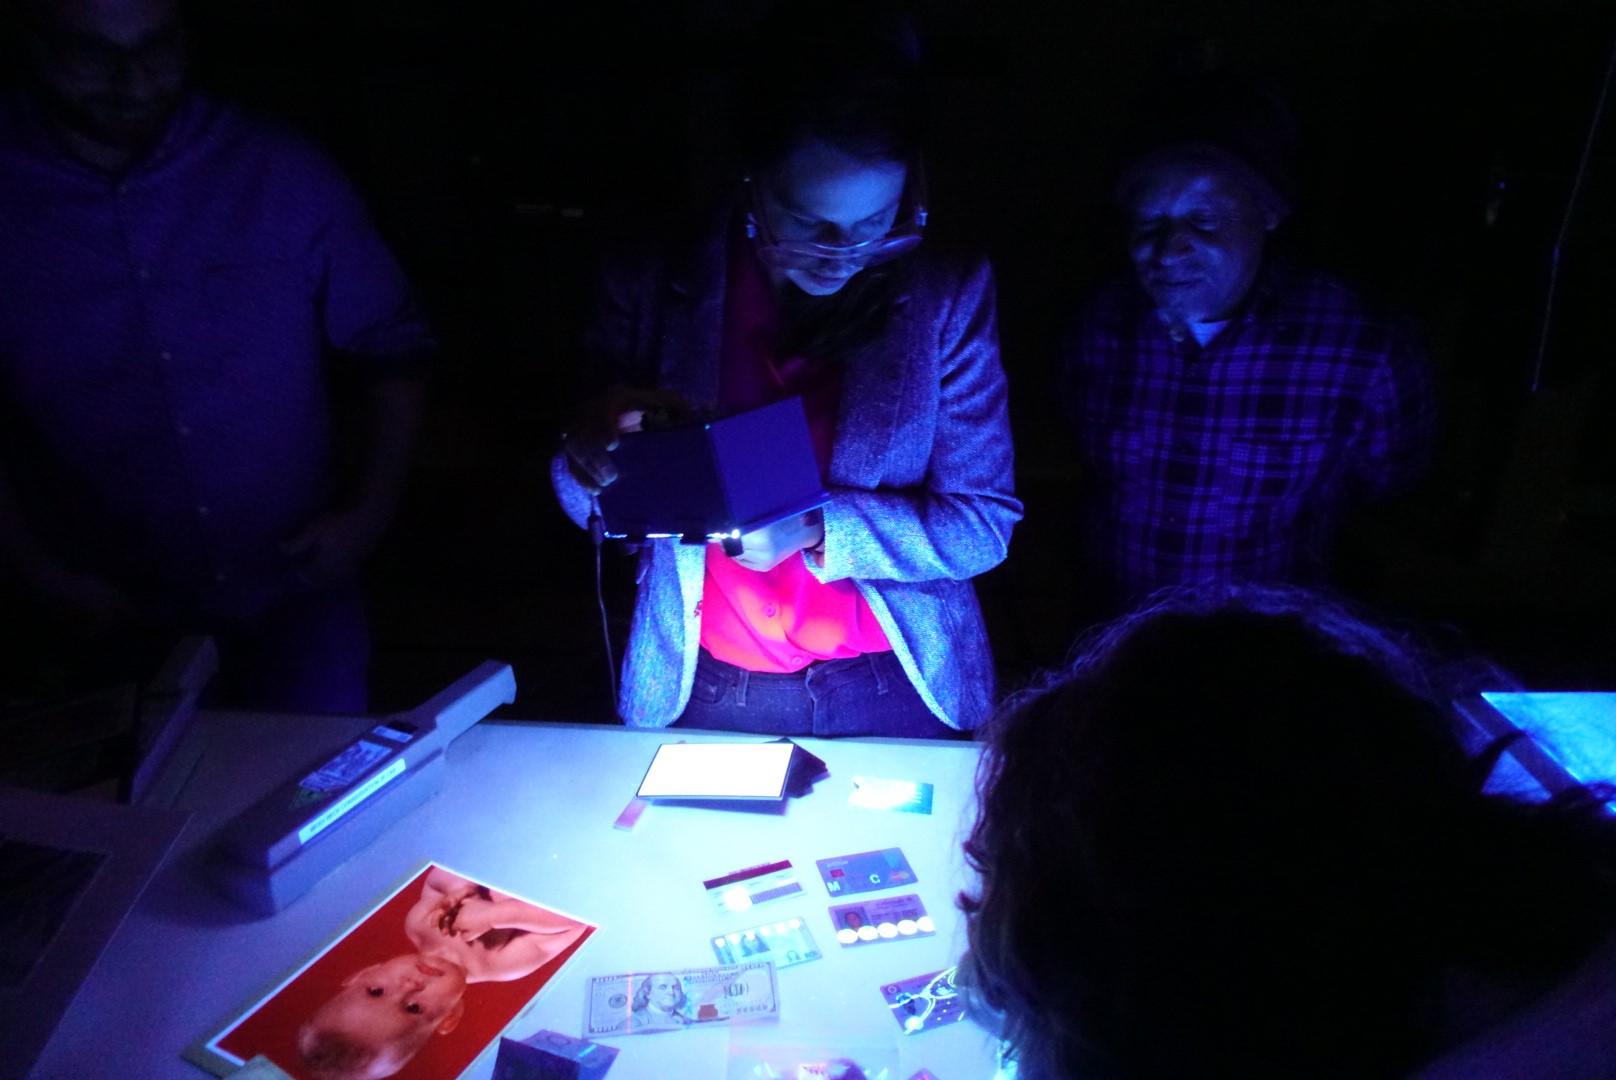 Conservation UV imaging blog - imaging lamp